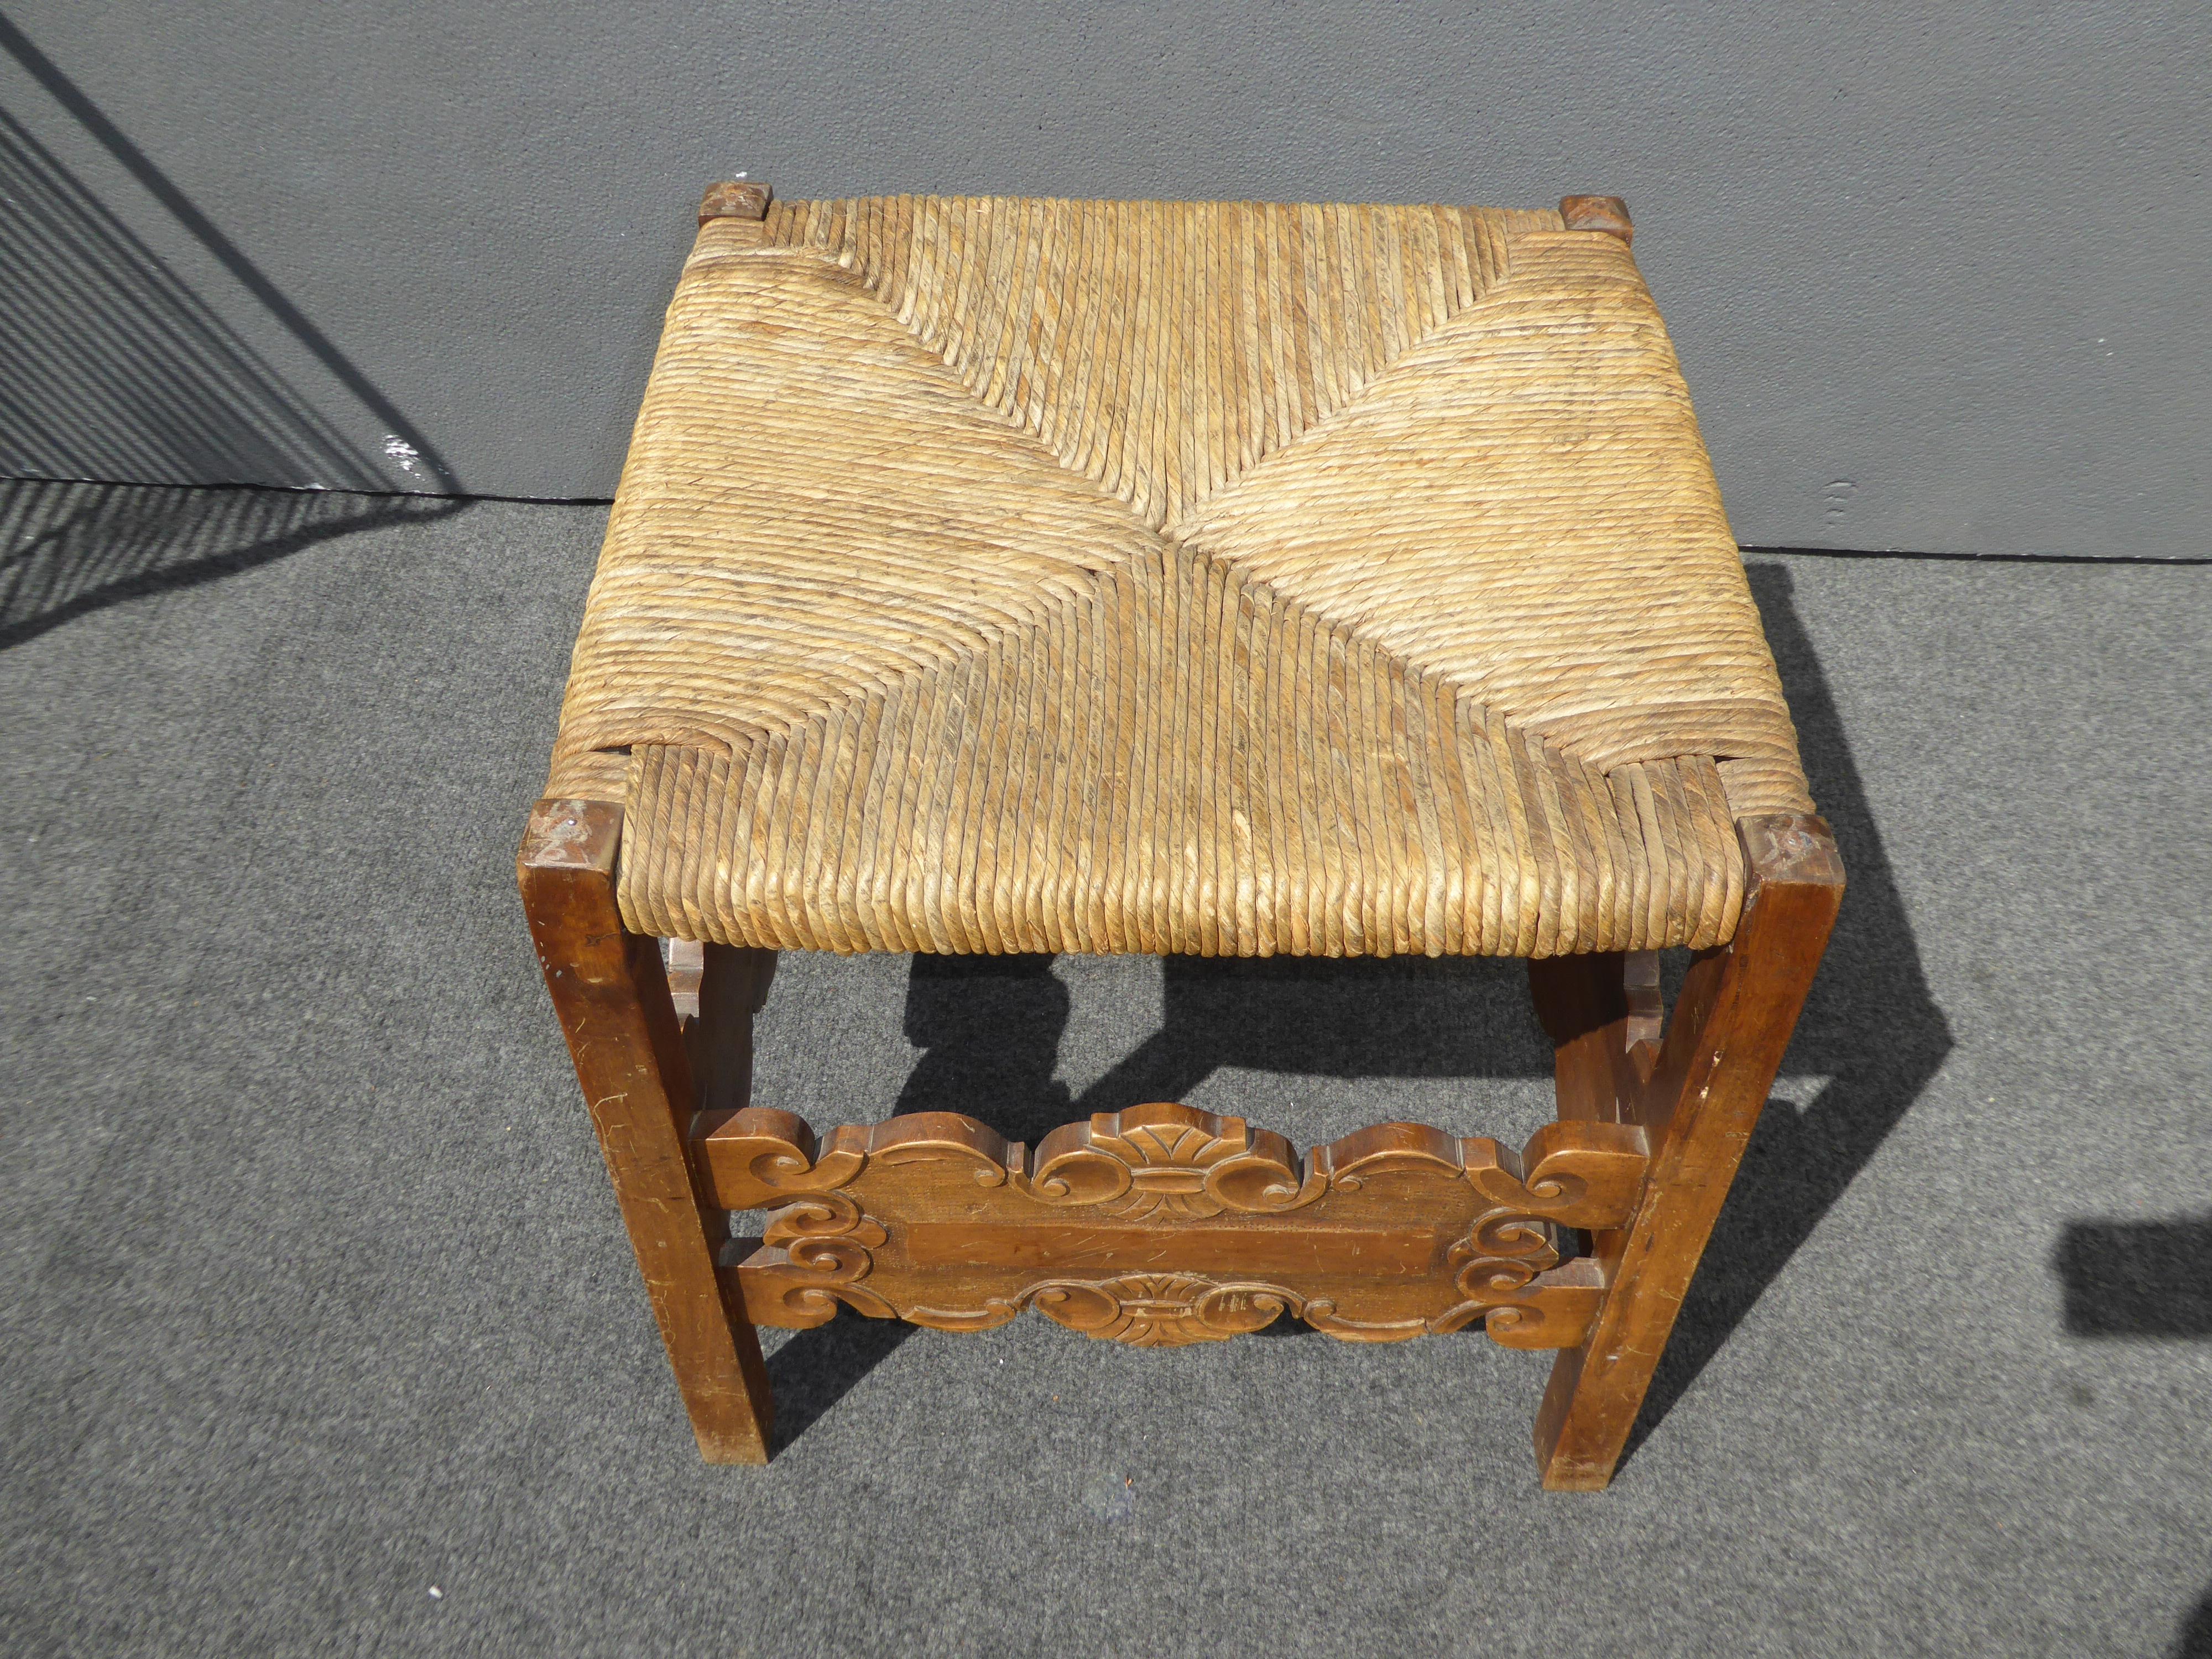 Spanish-Style Rush Seat Stool - Image 6 of 9  sc 1 st  Chairish & Spanish-Style Rush Seat Stool   Chairish islam-shia.org